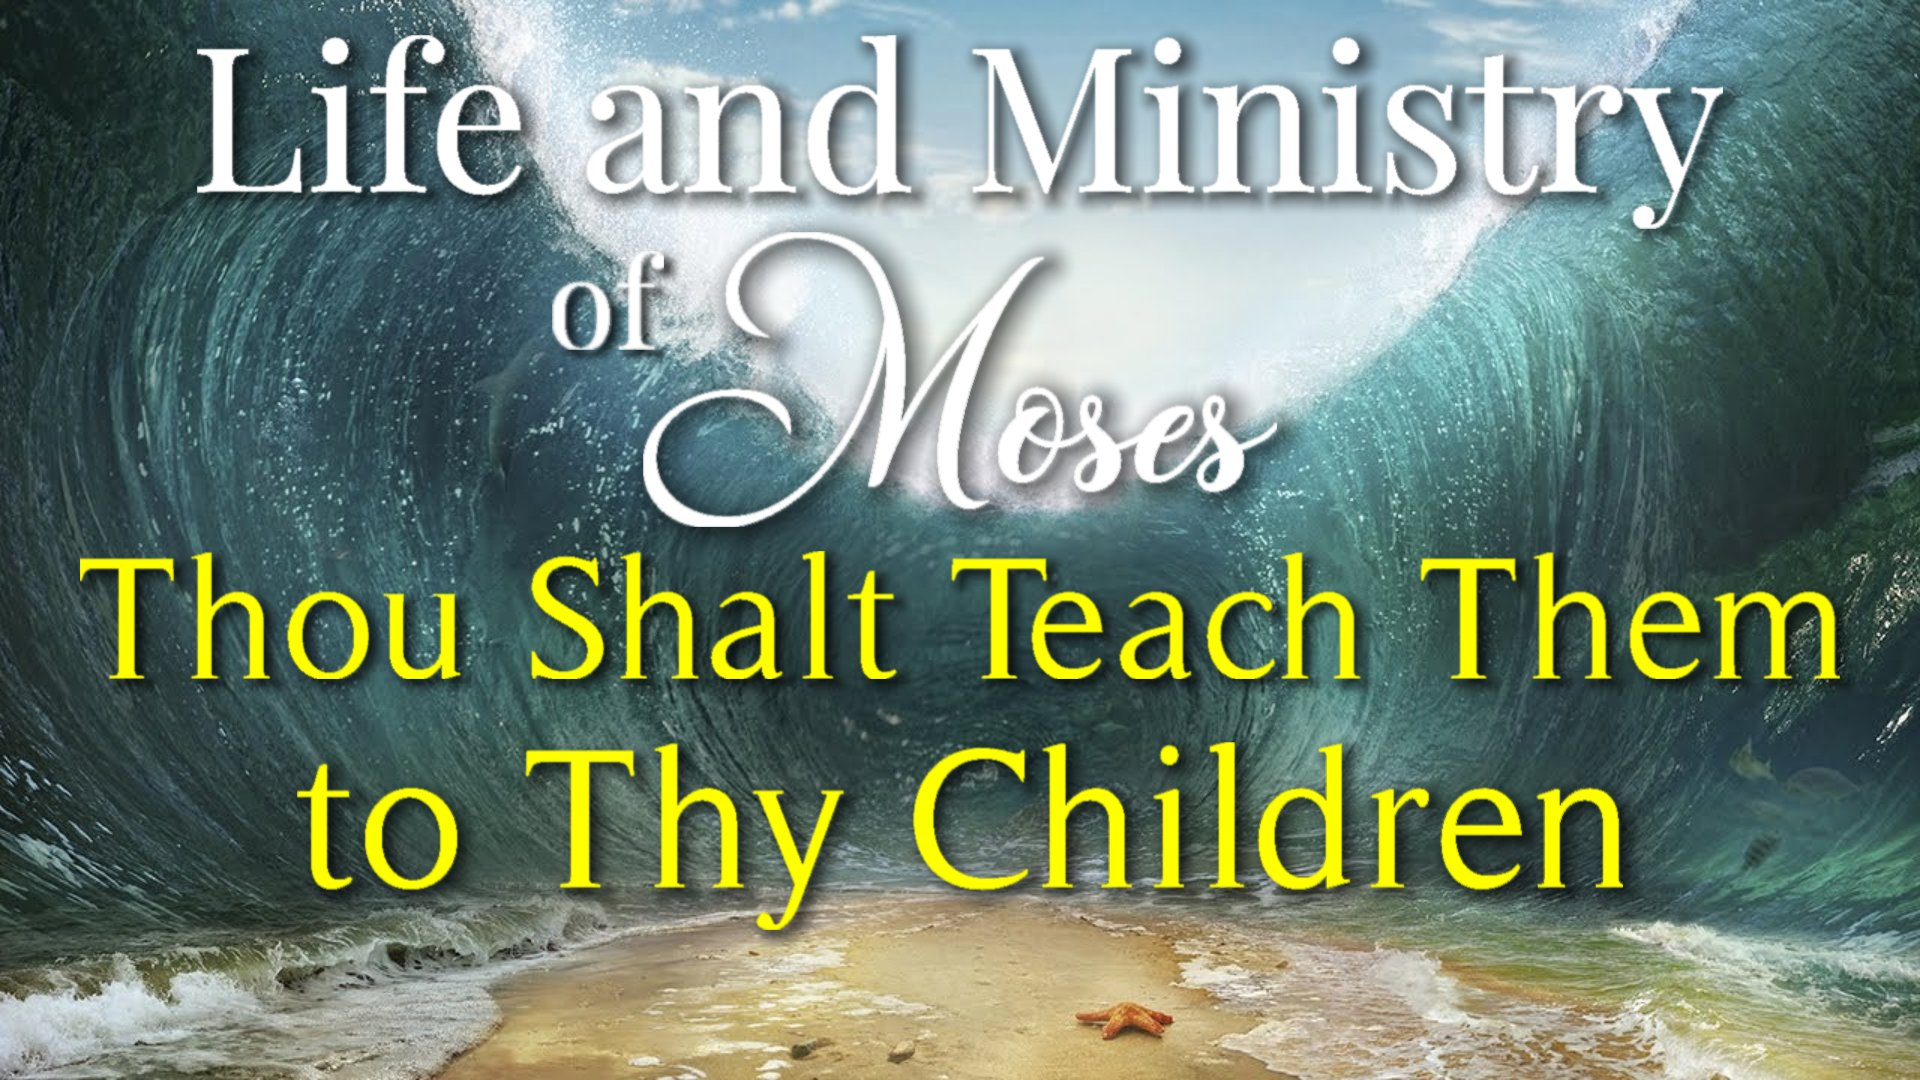 49 Thou Shalt Teach Them to Thy Children